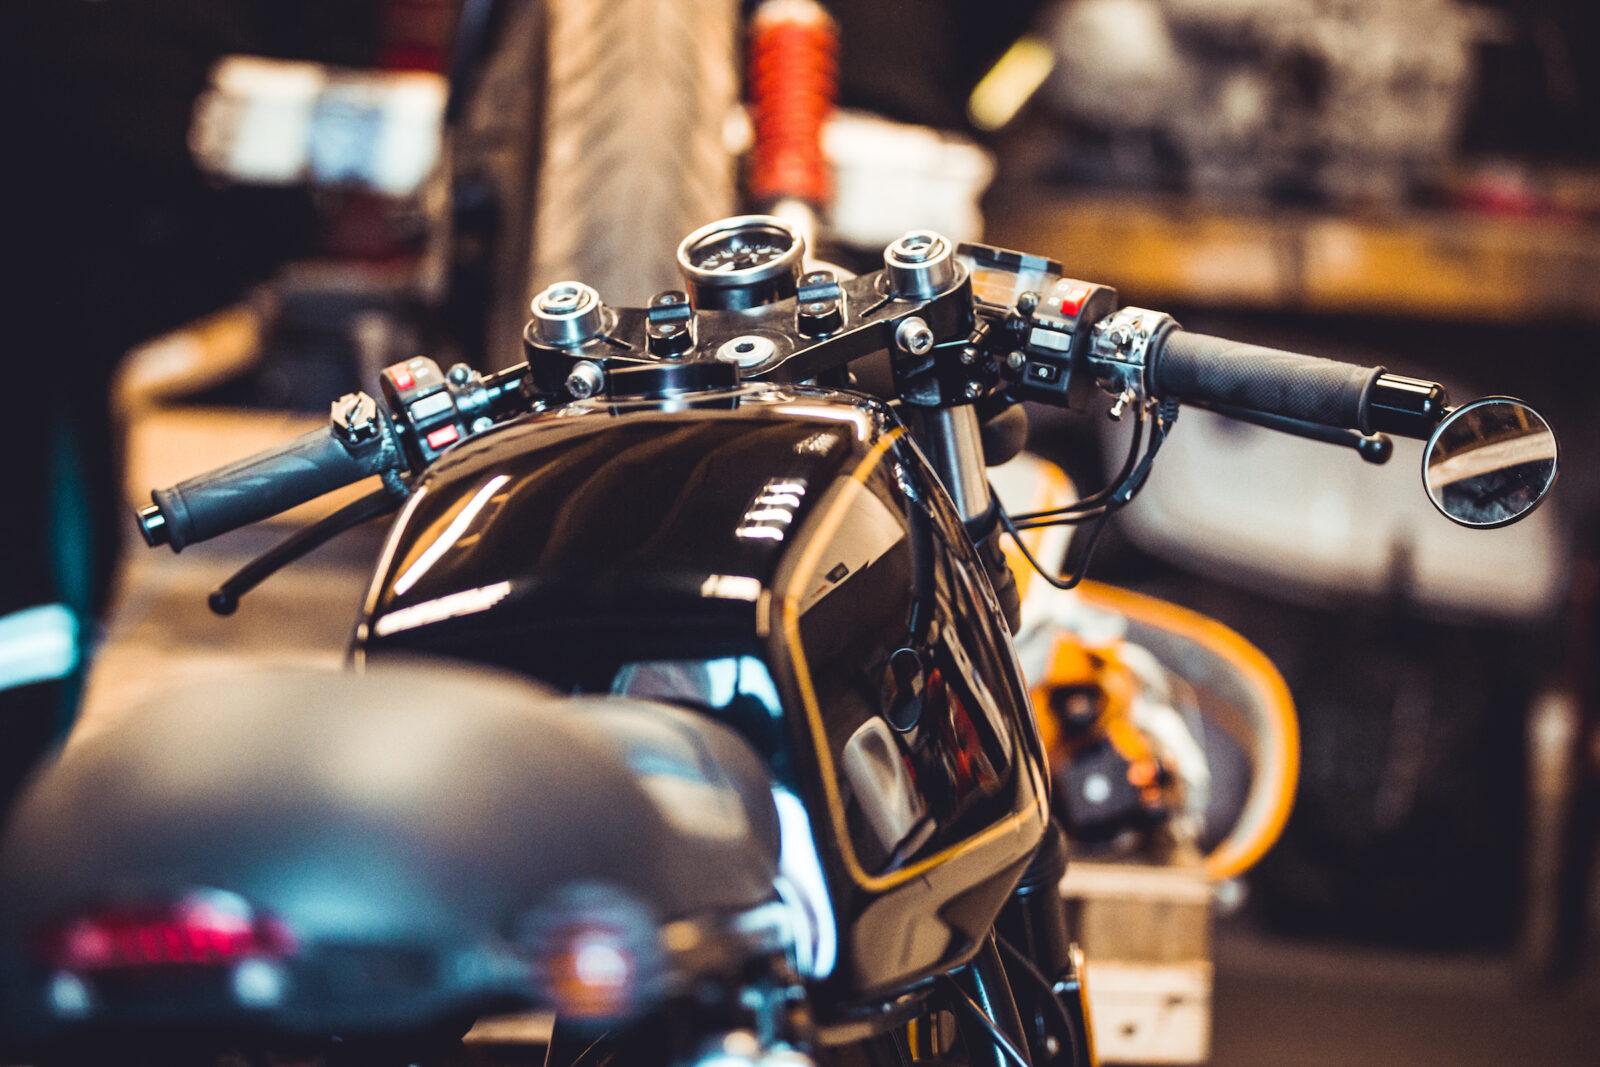 BMW R45 Custom Motorcycle 12 1600x1067 - JM Customs BMW R45 Cafe Racer